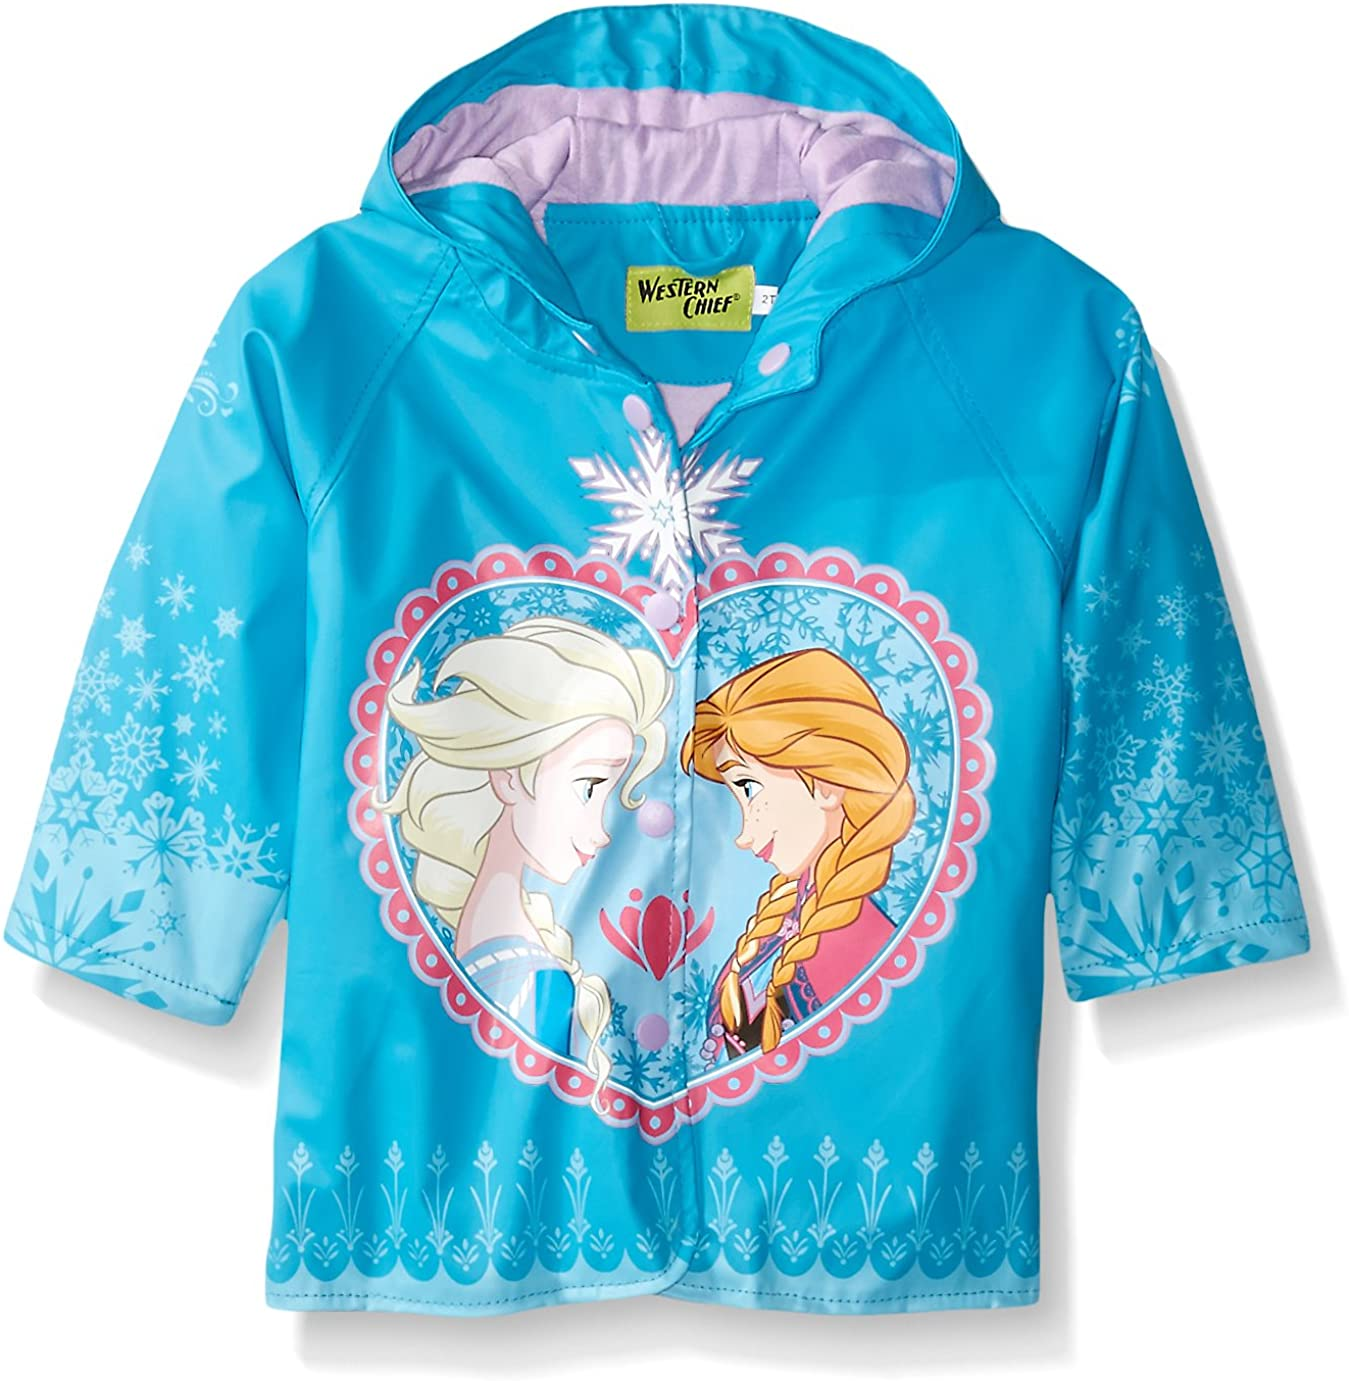 Western Chief Kids Disney Character lined Rain Jacket Ariel Disney Princess 6